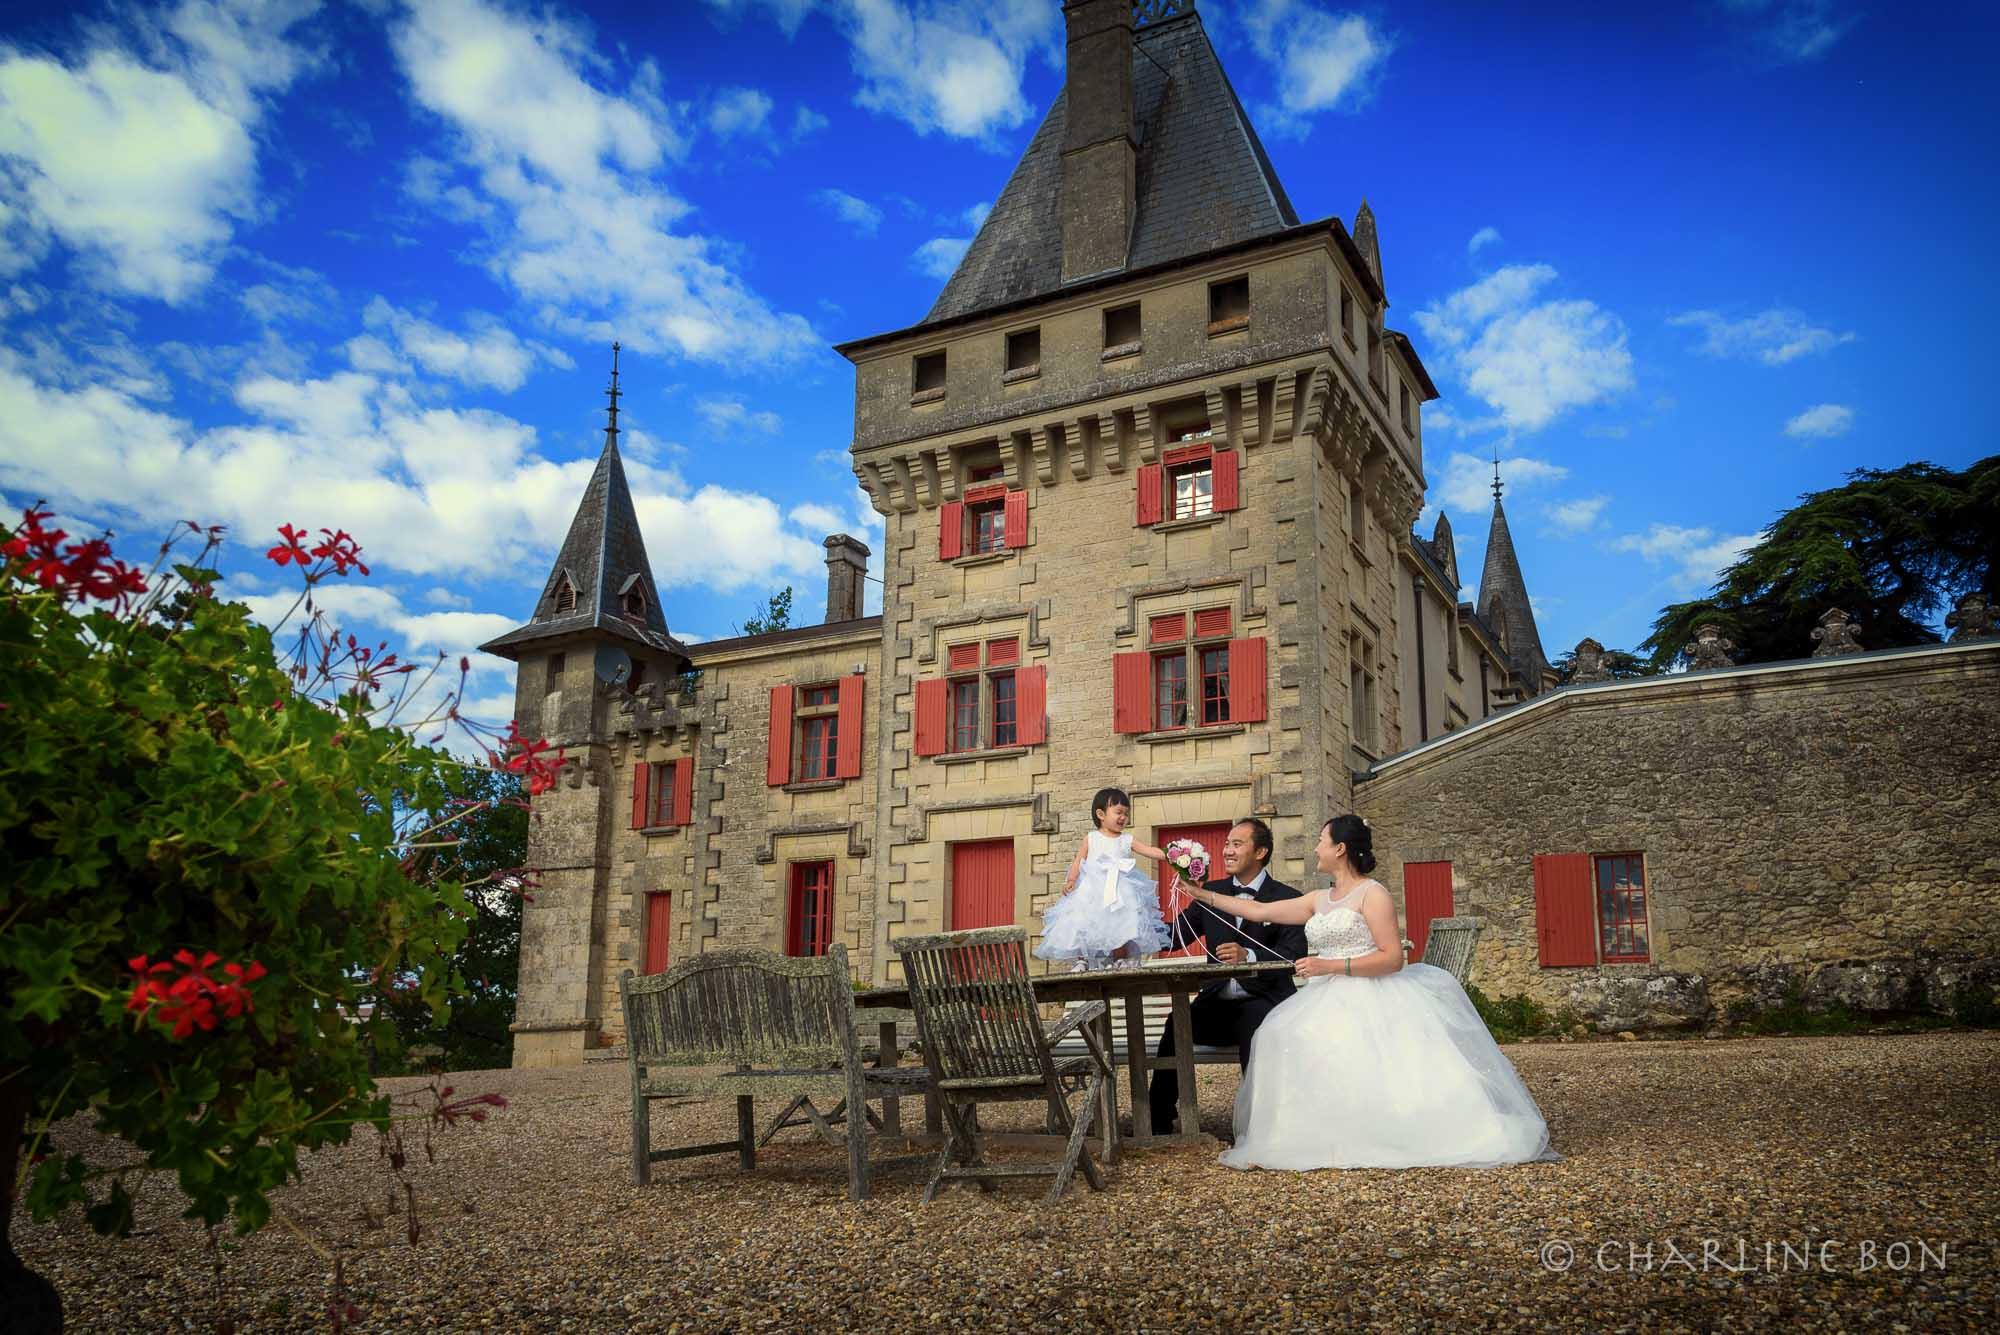 Oenotourisme - The best souvenirs of Bordeaux to bring back home